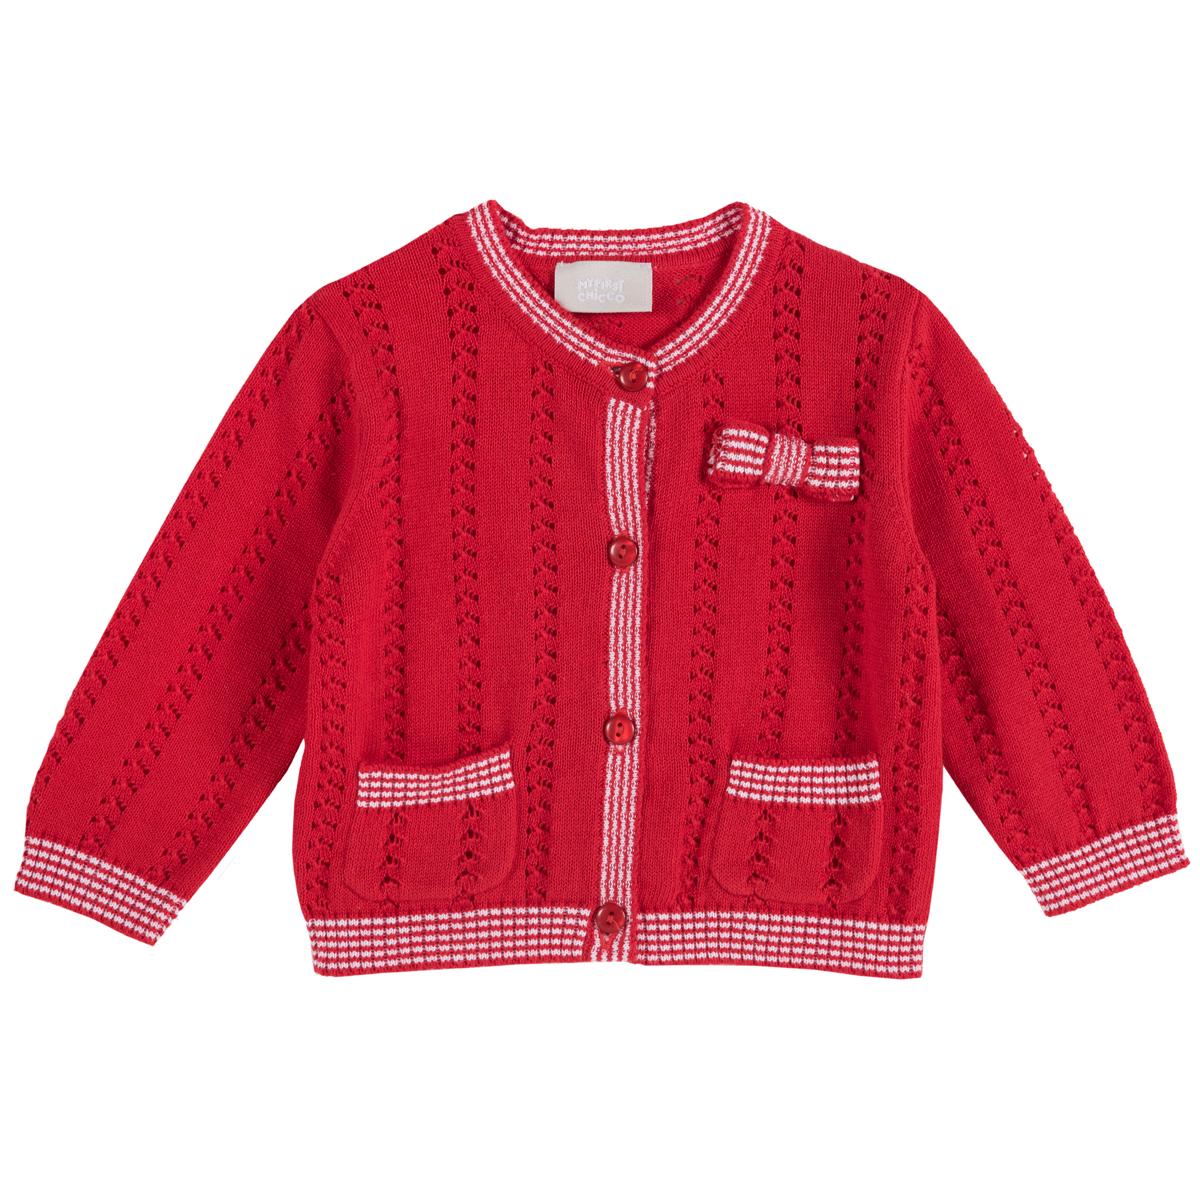 Cardigan copii Chicco, tricotat, rosu, 96795 din categoria Cardigan copii